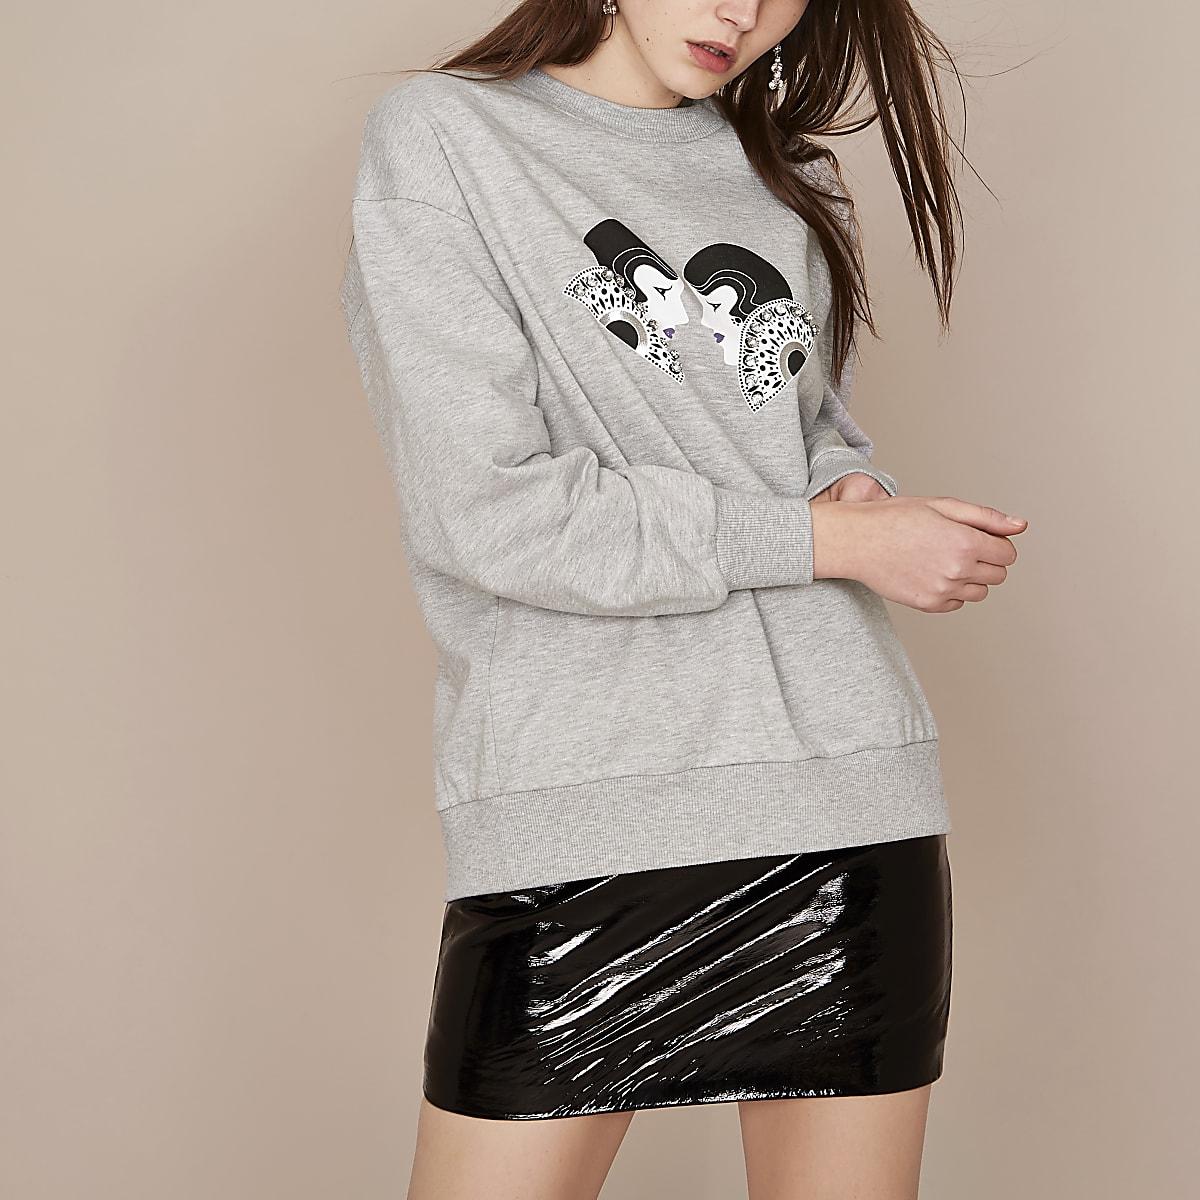 Grey Holly Fulton embellished sweatshirt